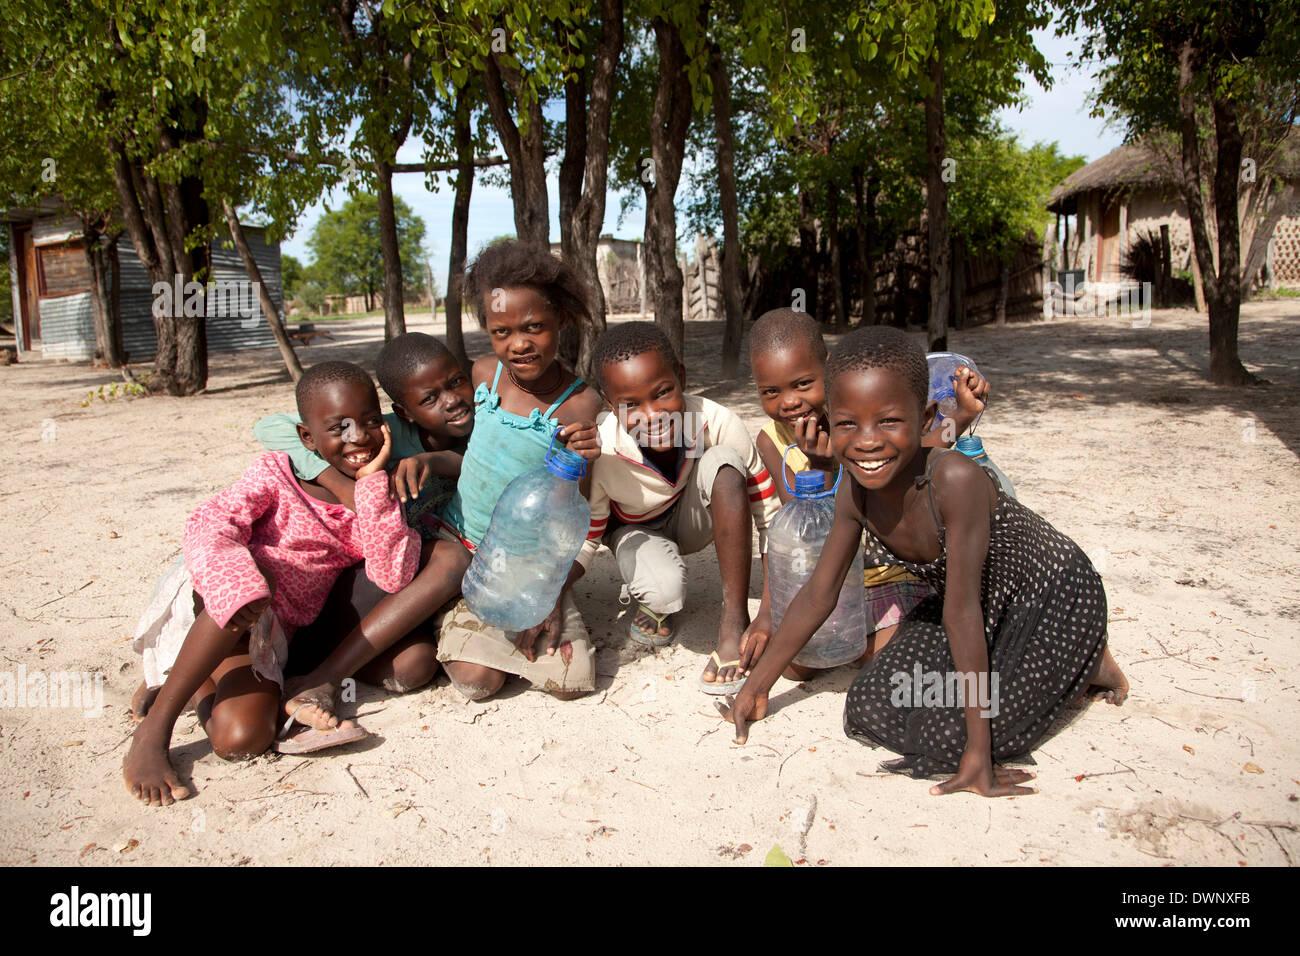 Cheerful children in a village in the Okavango Delta, Botswana - Stock Image